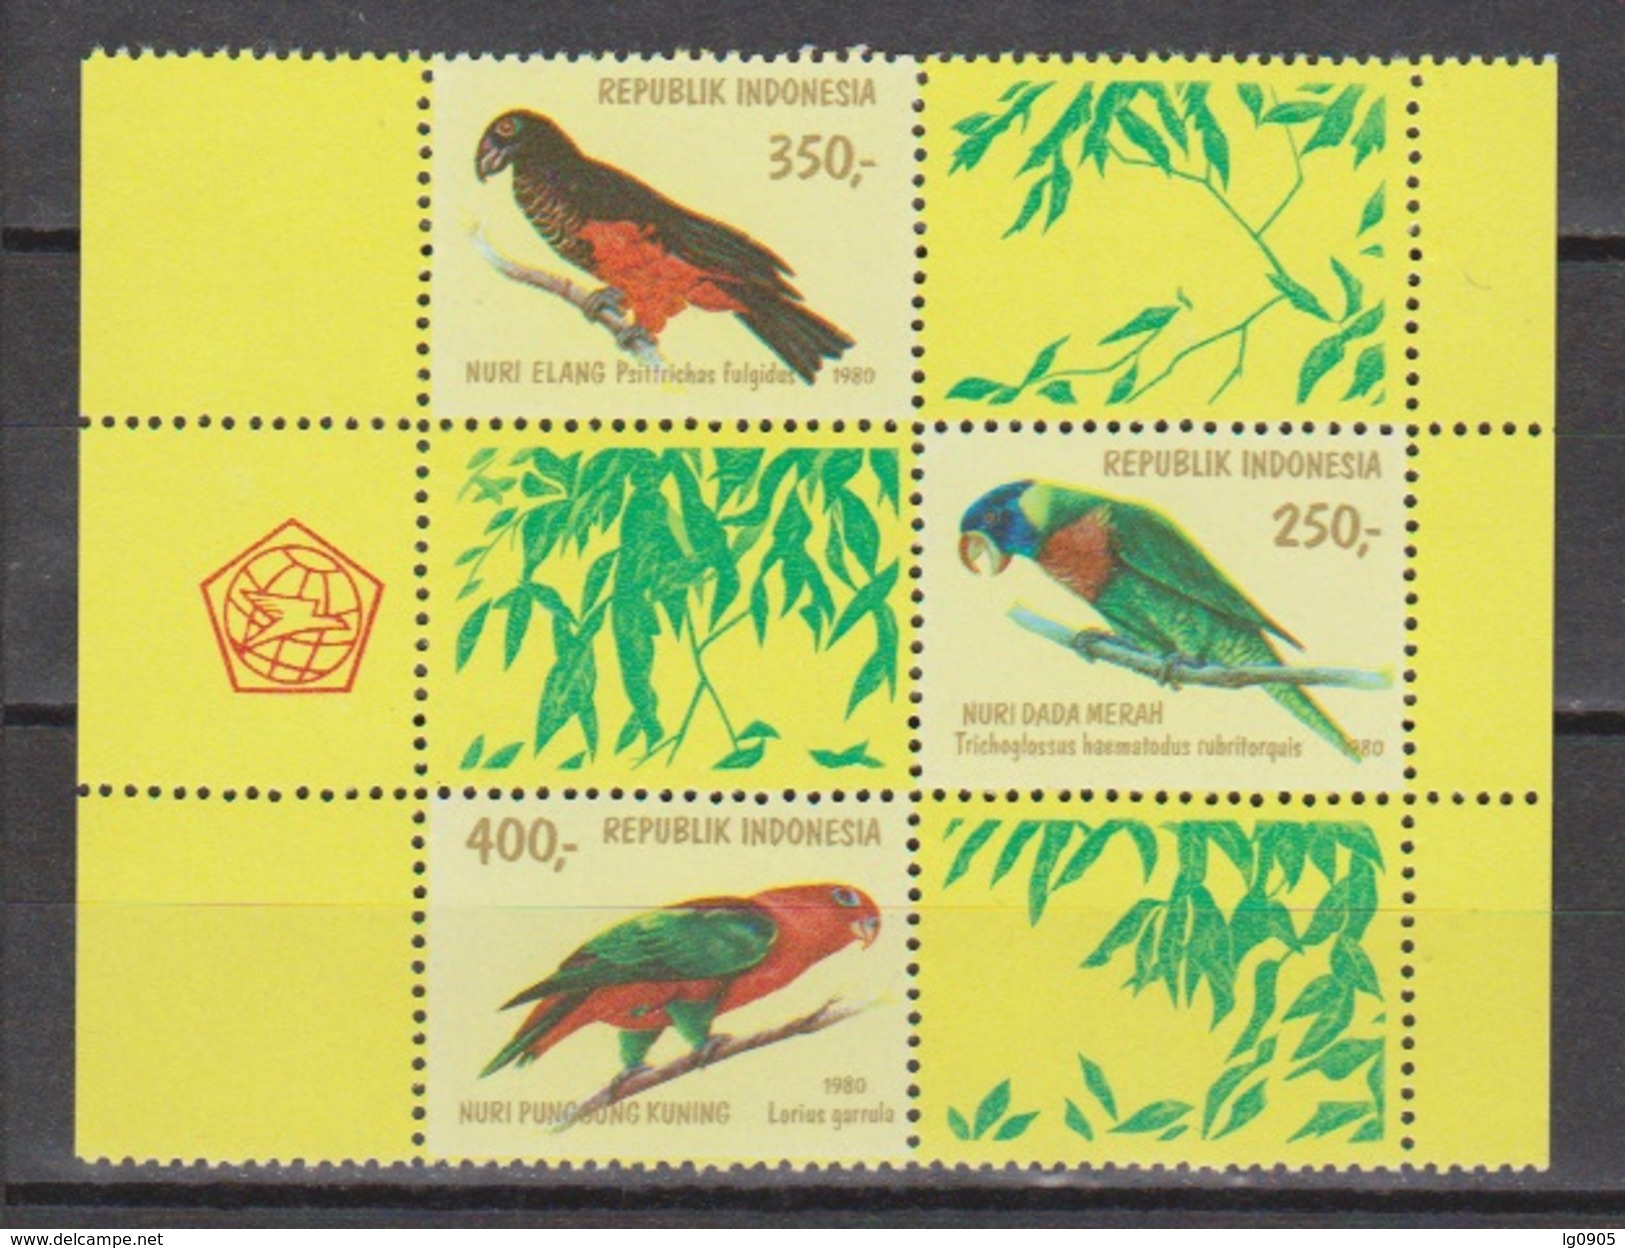 Indonesie 1026-1028 MNH Papegaai Perroquet Perruche Parrakeet Parots Papagayo Cotorra 1980 NOW MANY STAMPS INDONESIA - Papegaaien, Parkieten